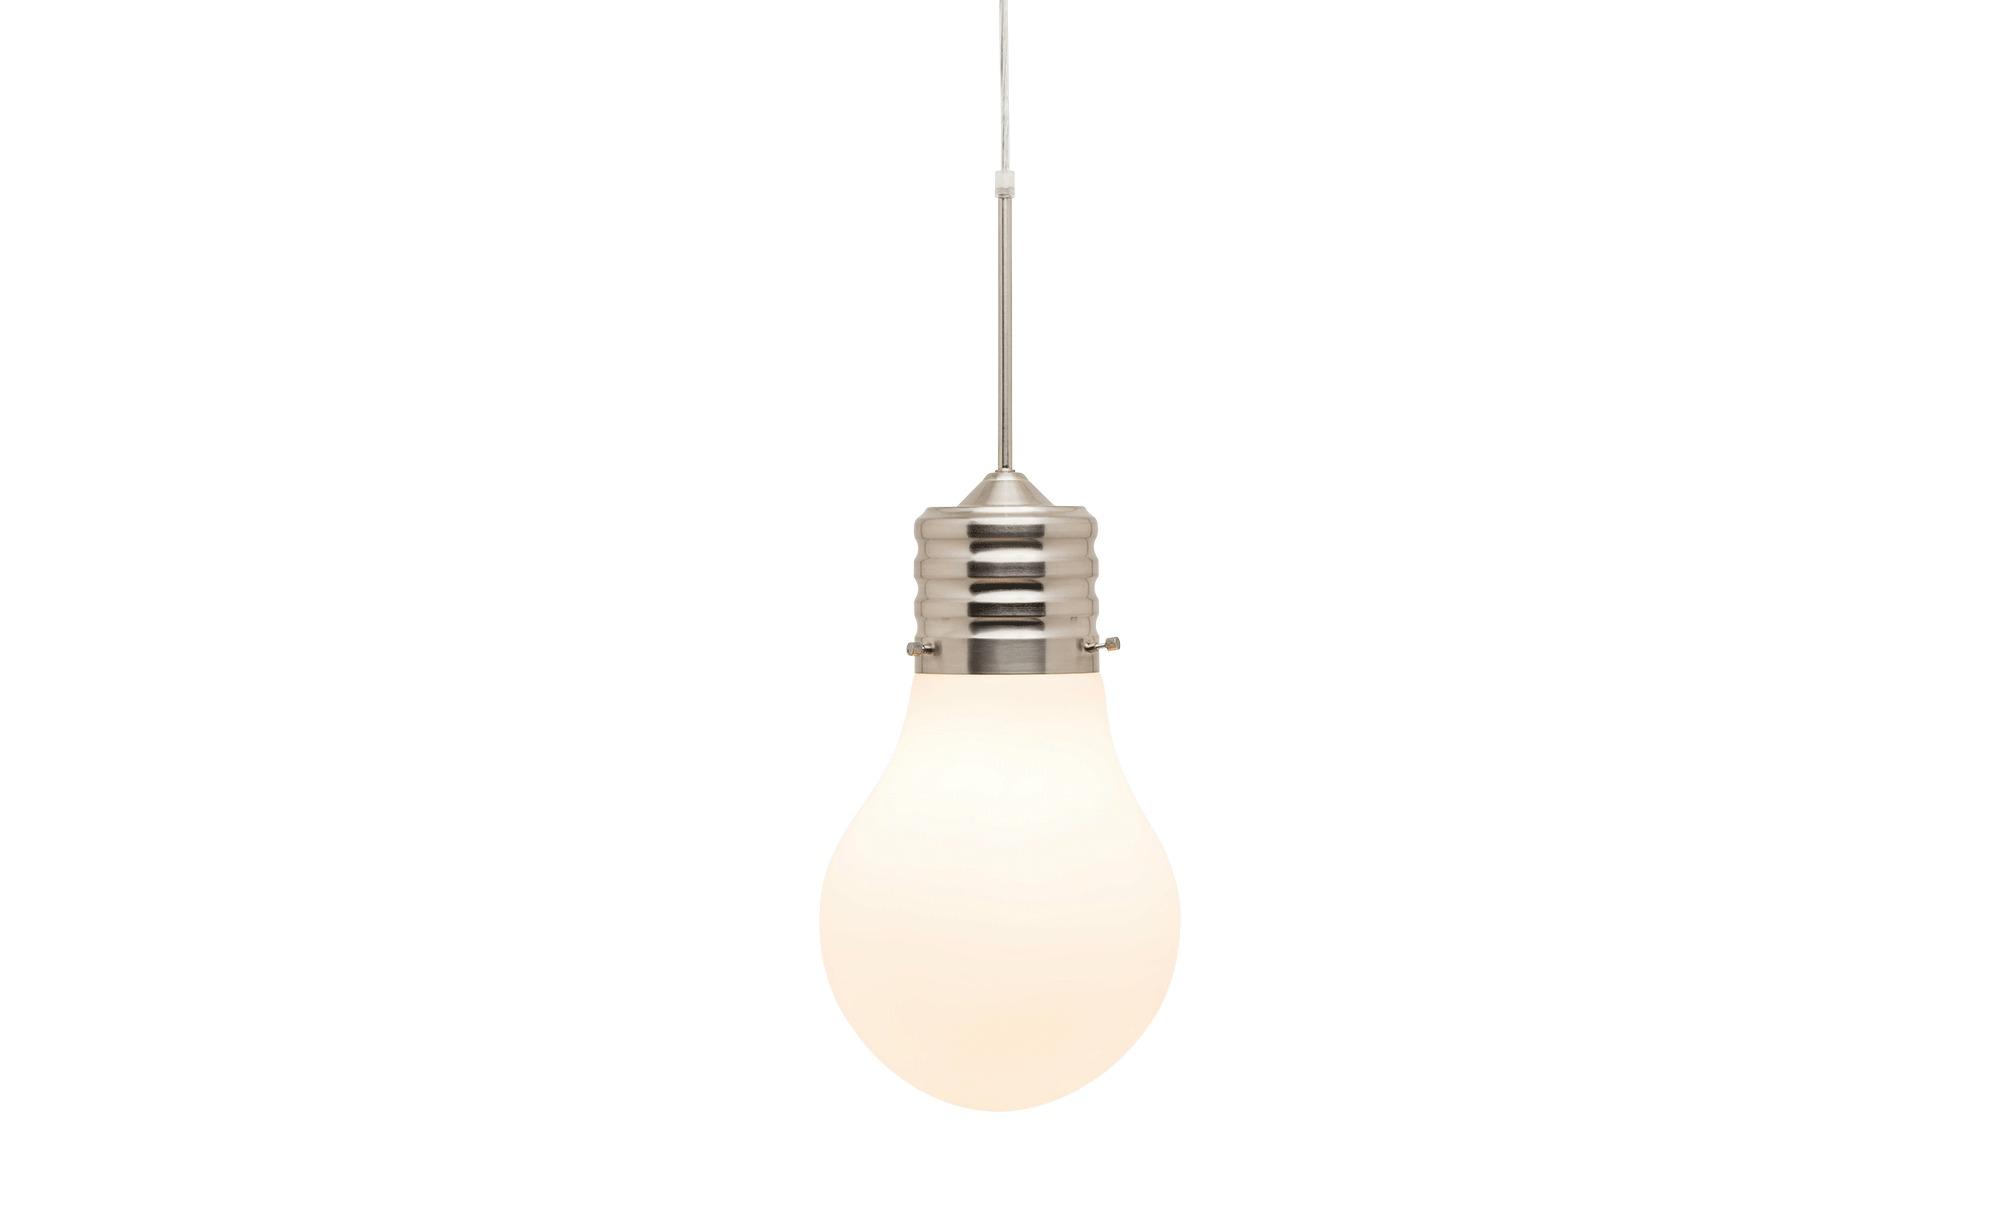 Pendelleuchte 1-flammig im Glühlampen-Design ¦ silberØ: [25.0] Lampen & Leuchten > Innenleuchten > Pendelleuchten - Höffner